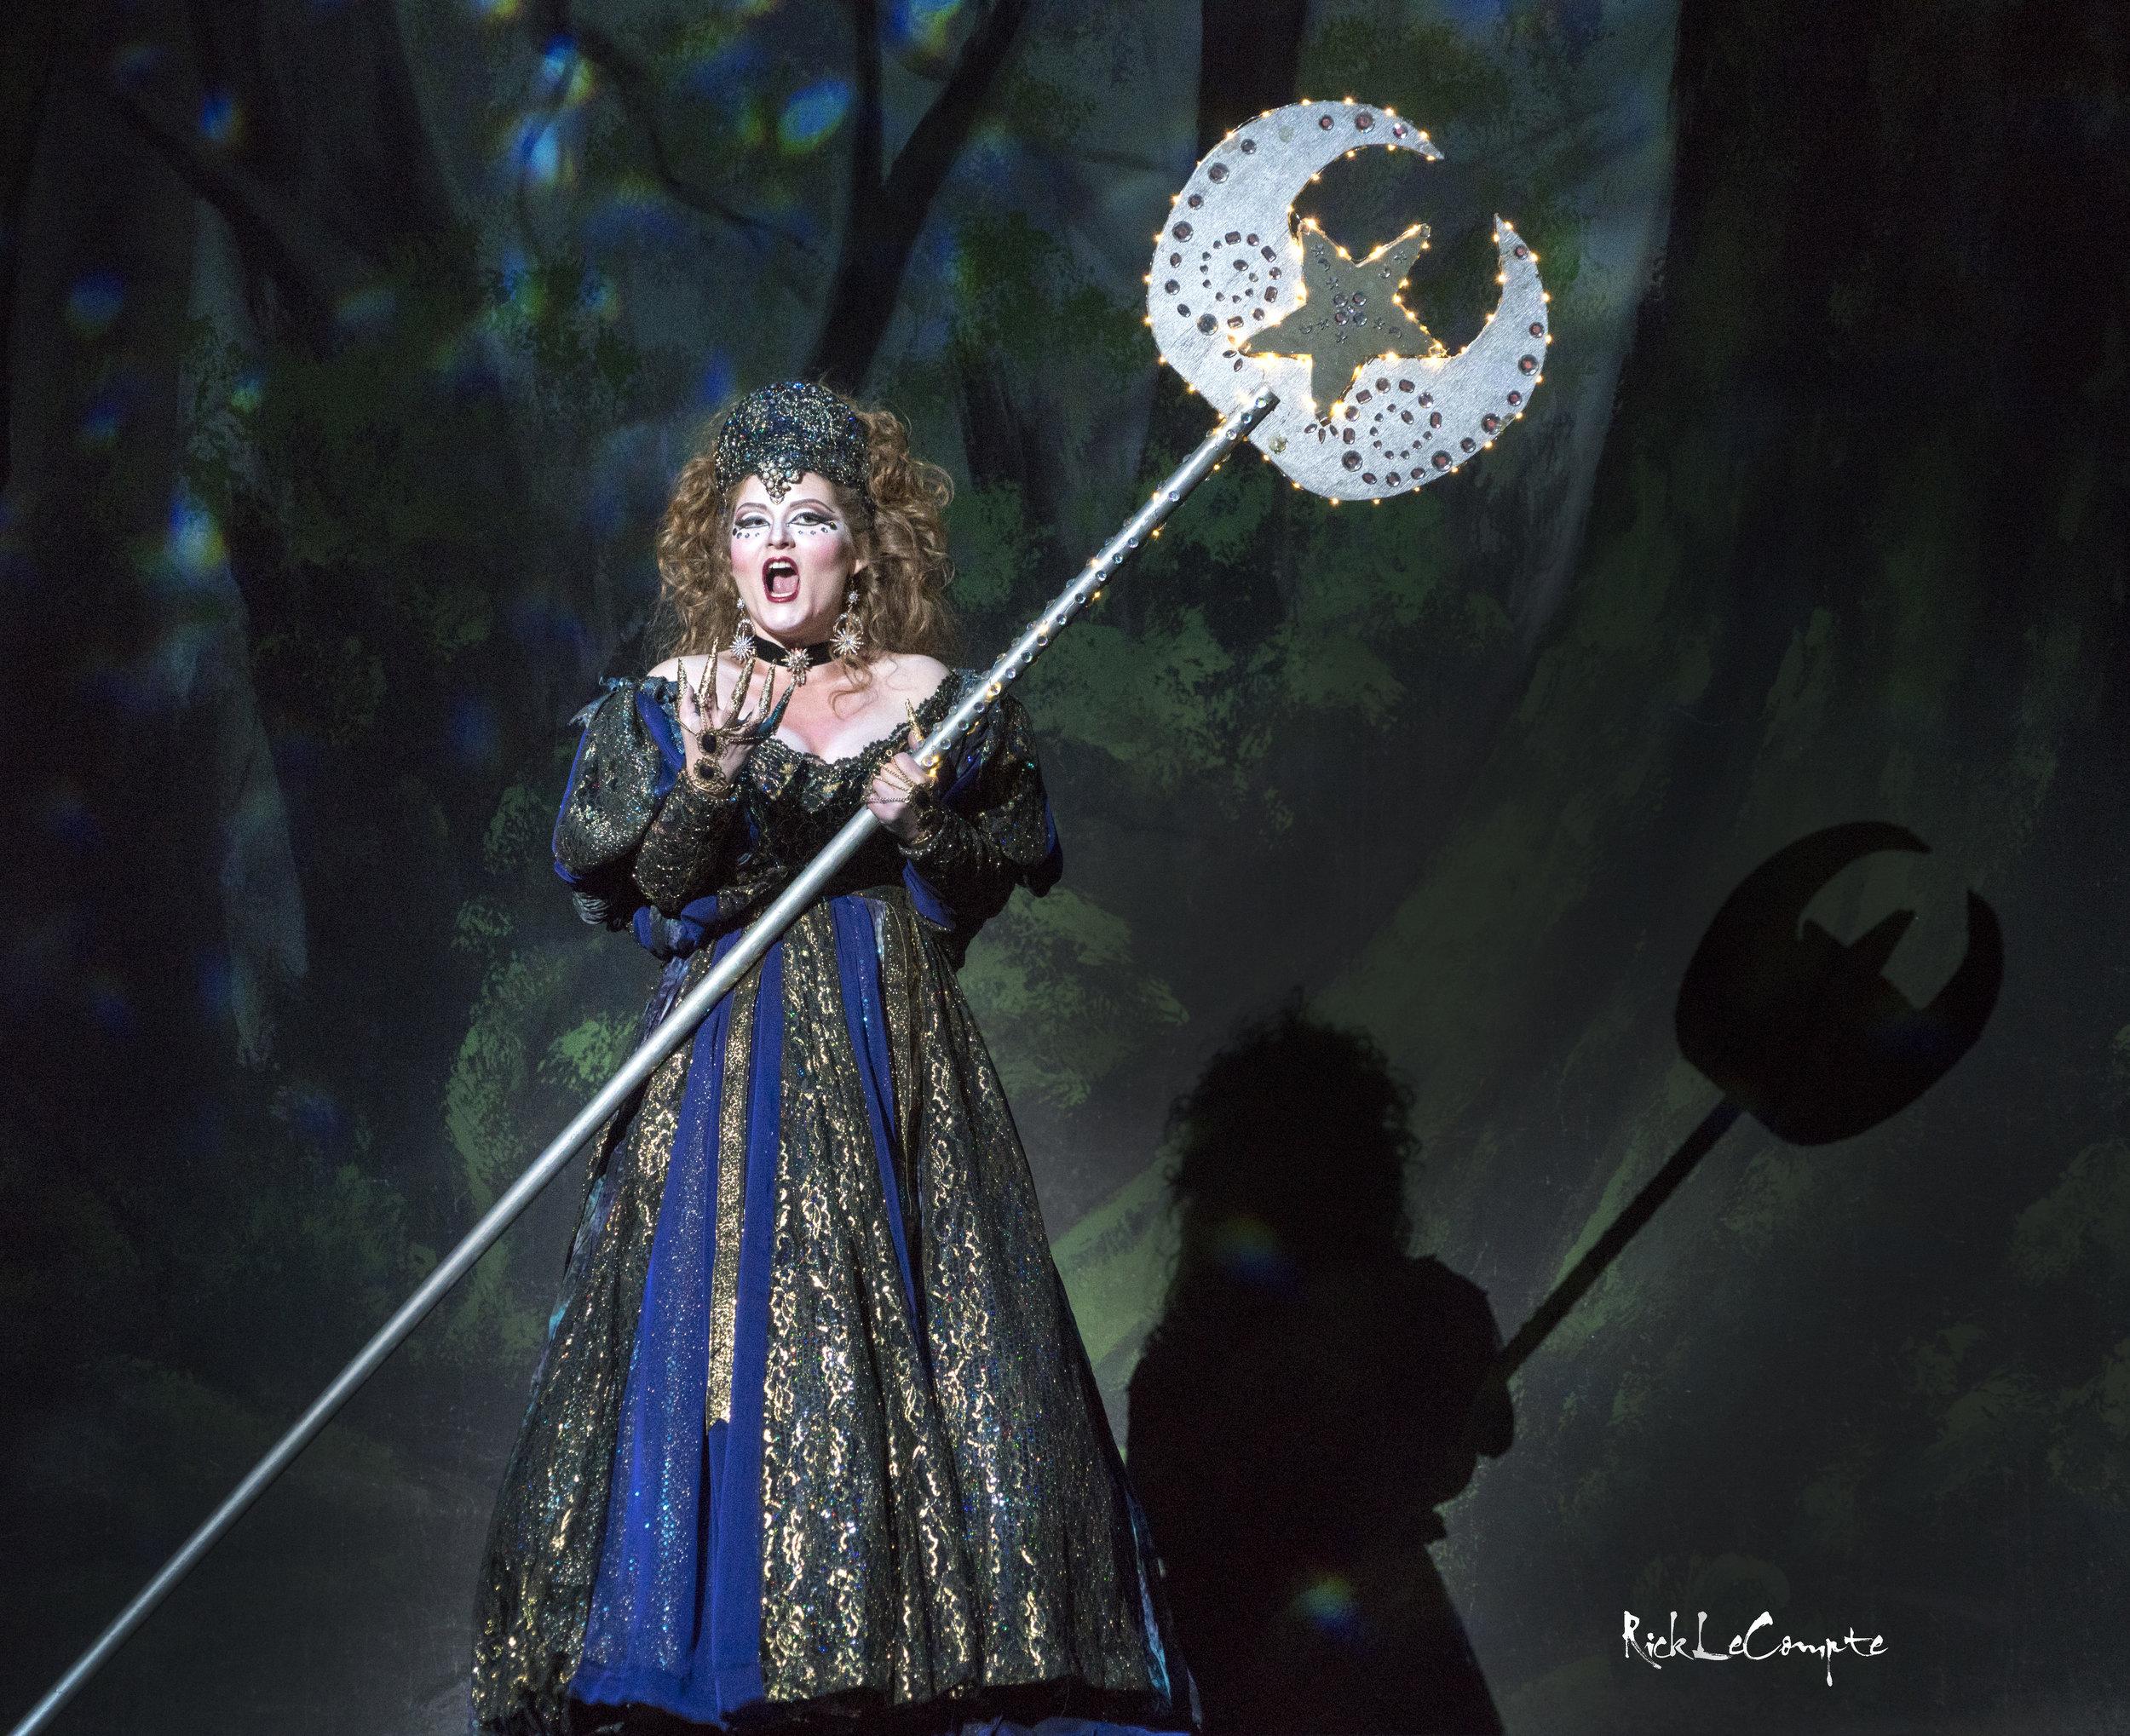 The Magic Flute - 2017 - Opera Louisiane - Baton Rouge, LA - Photo by Rick LeCompte